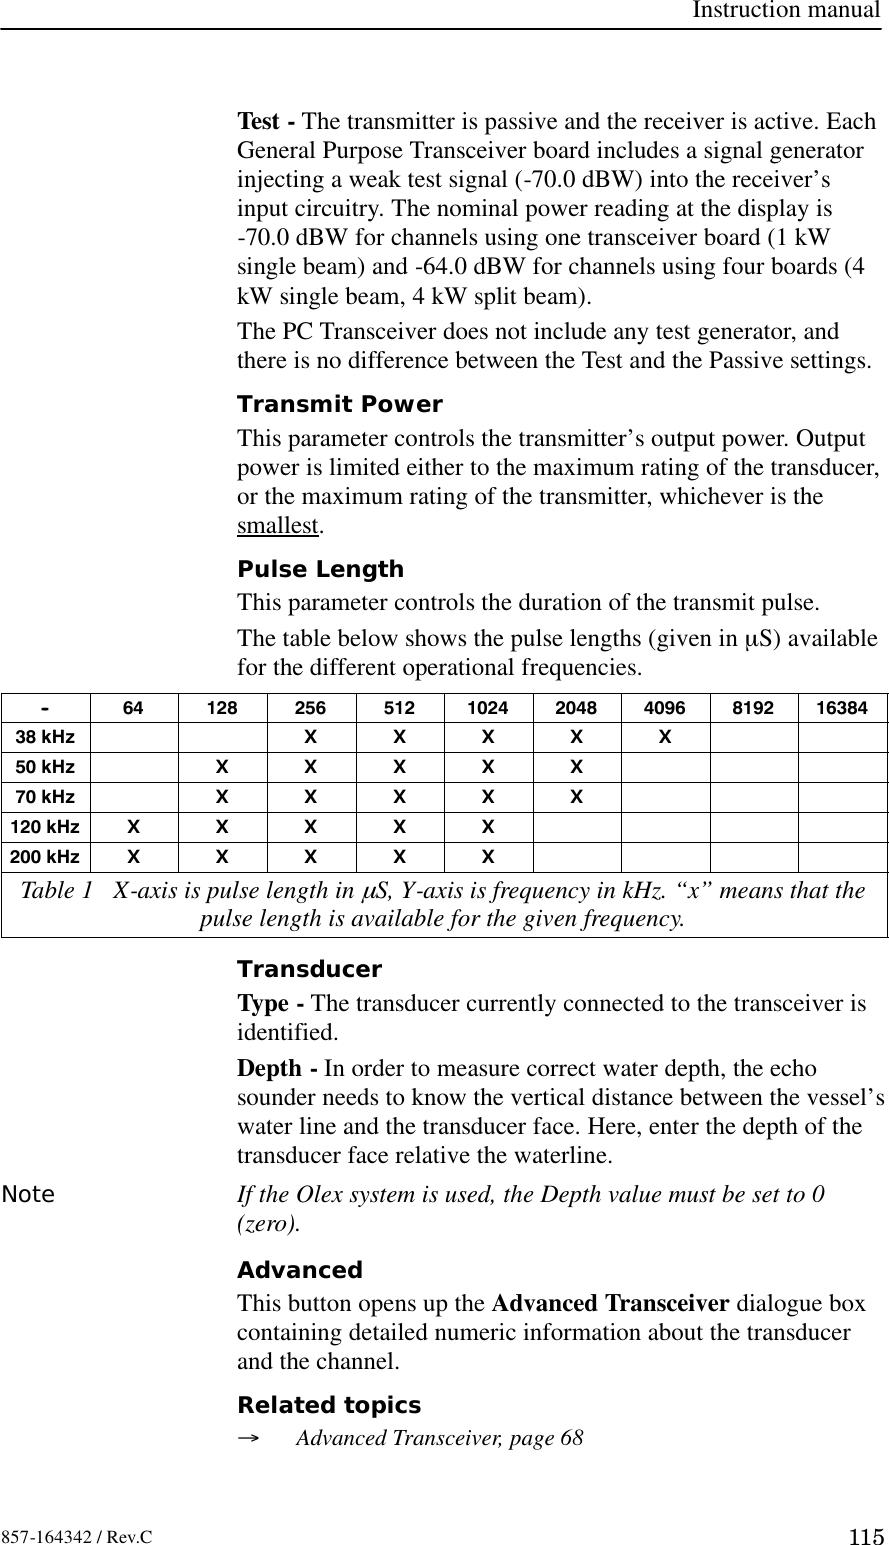 Simrad Eq60 Users Manual INM